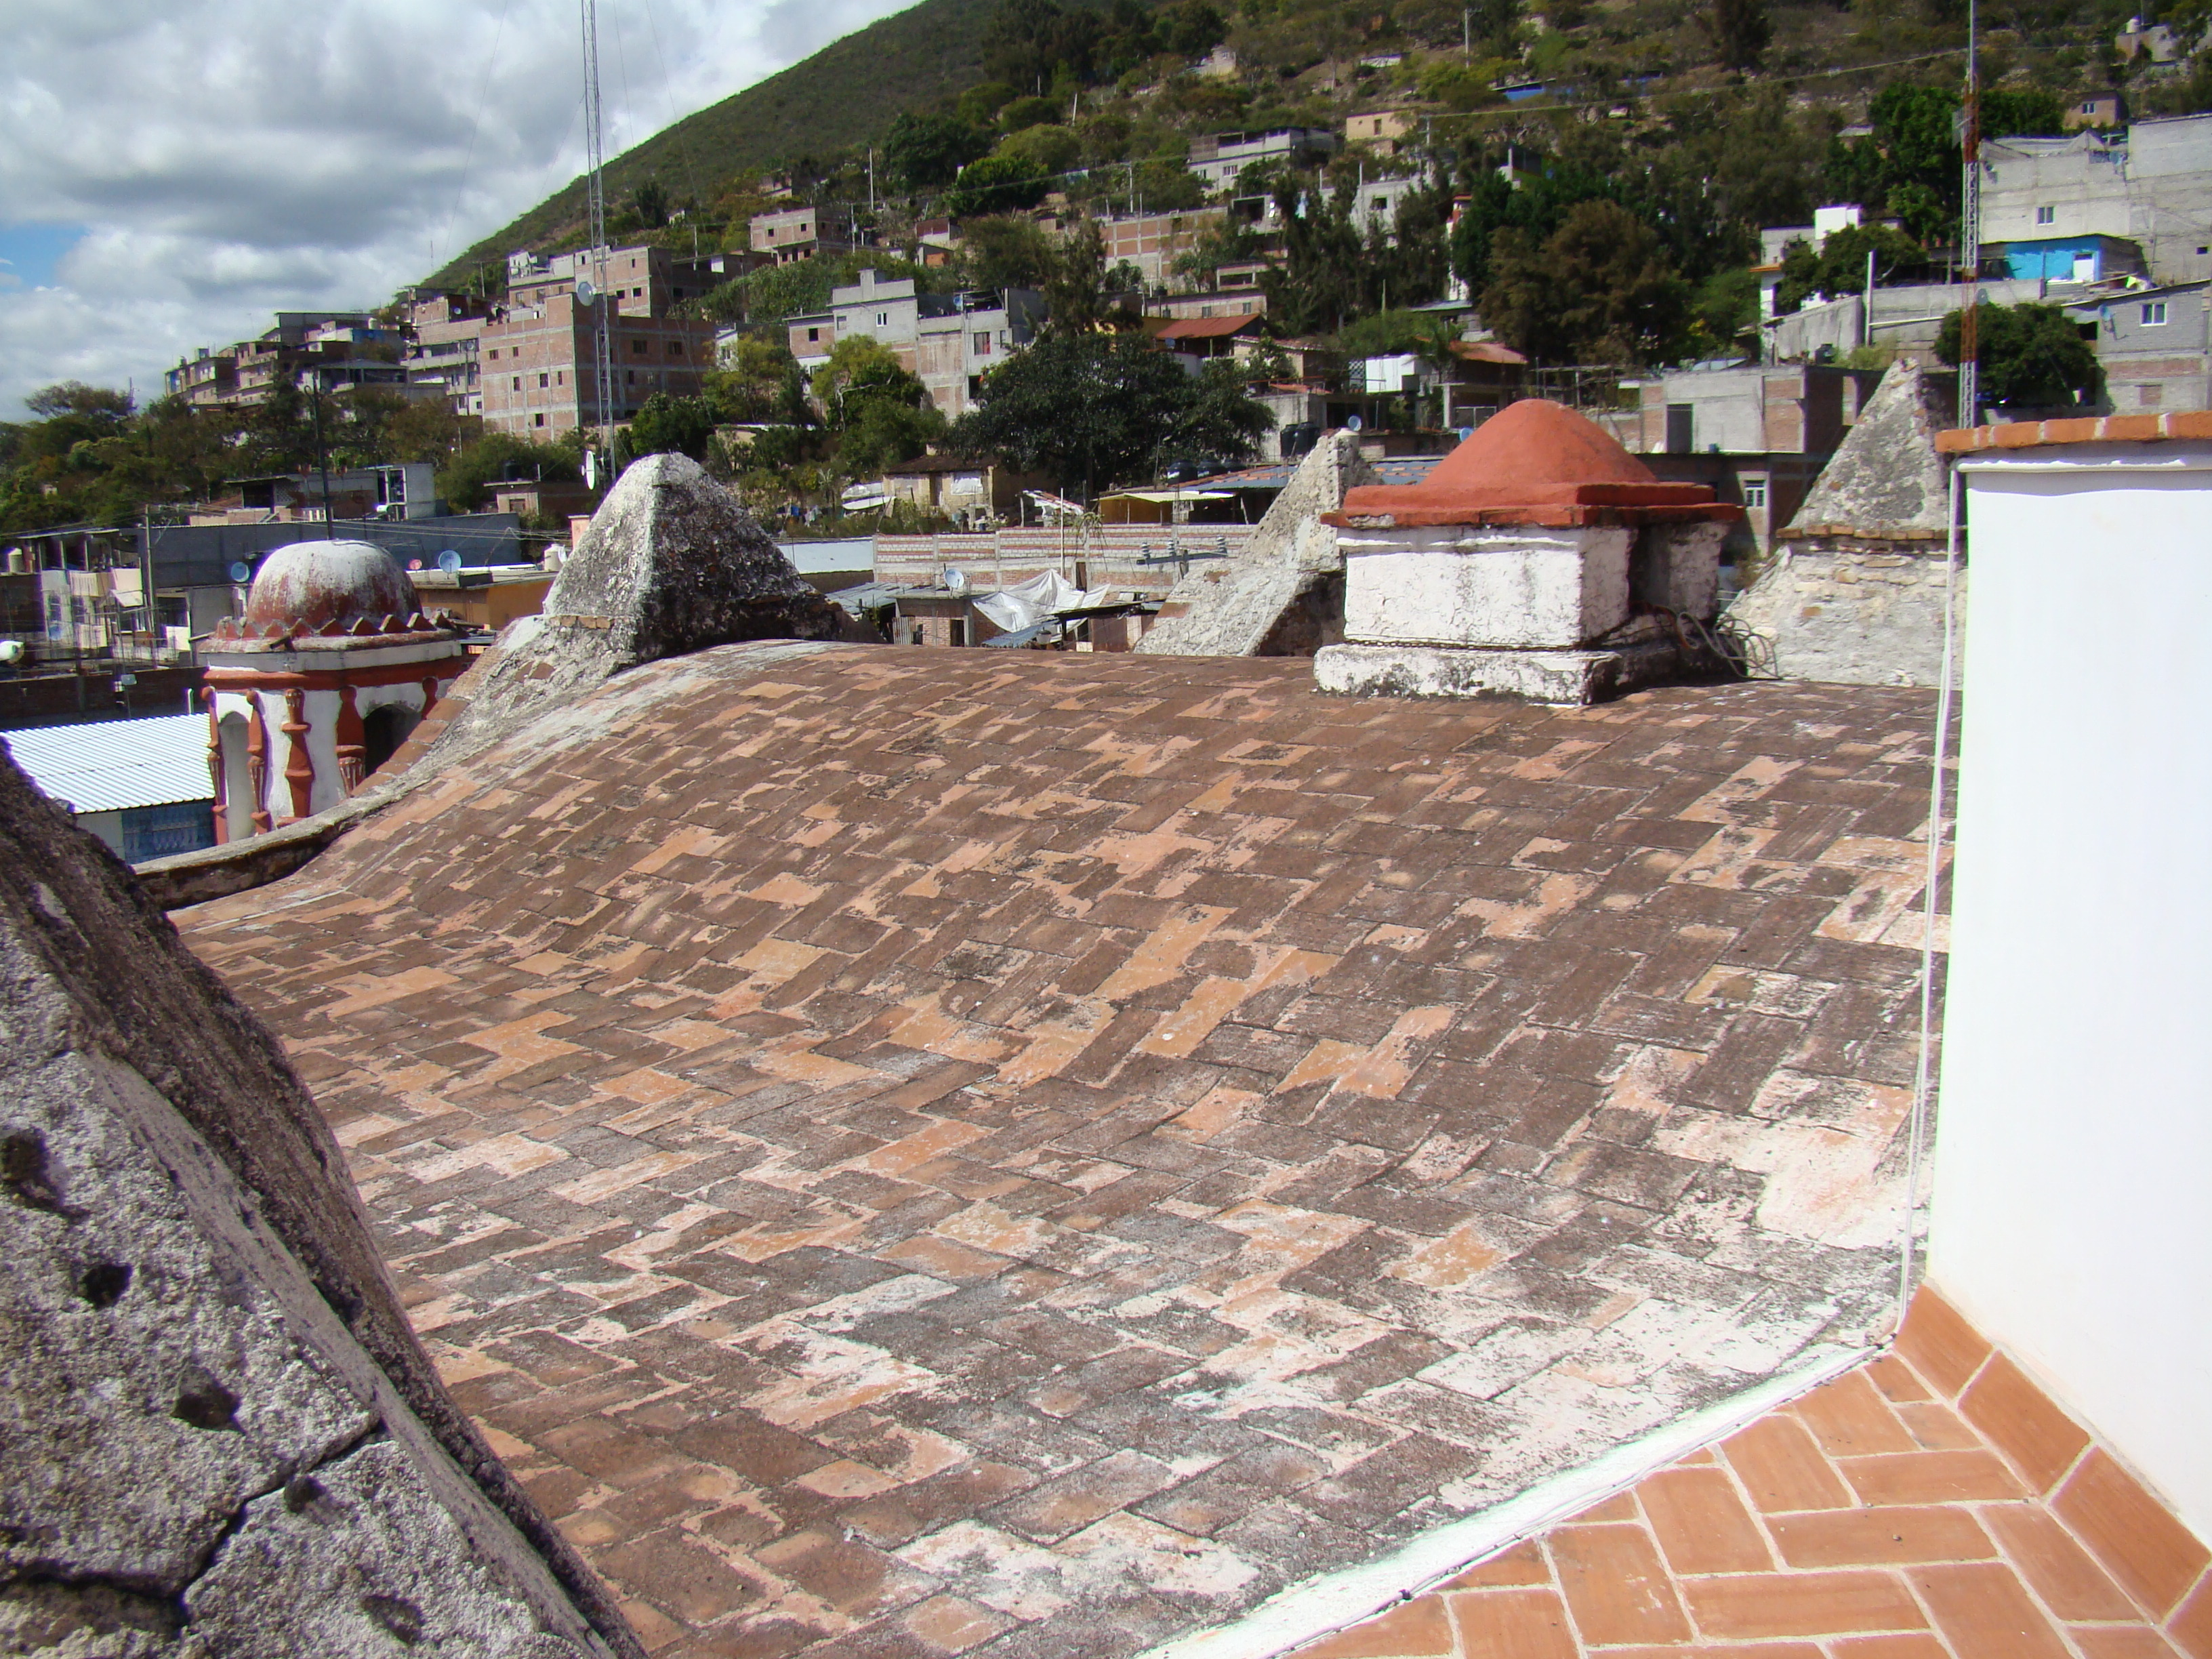 INAH e INPAC recorren el templo de la comunidad de San Pablo Güila